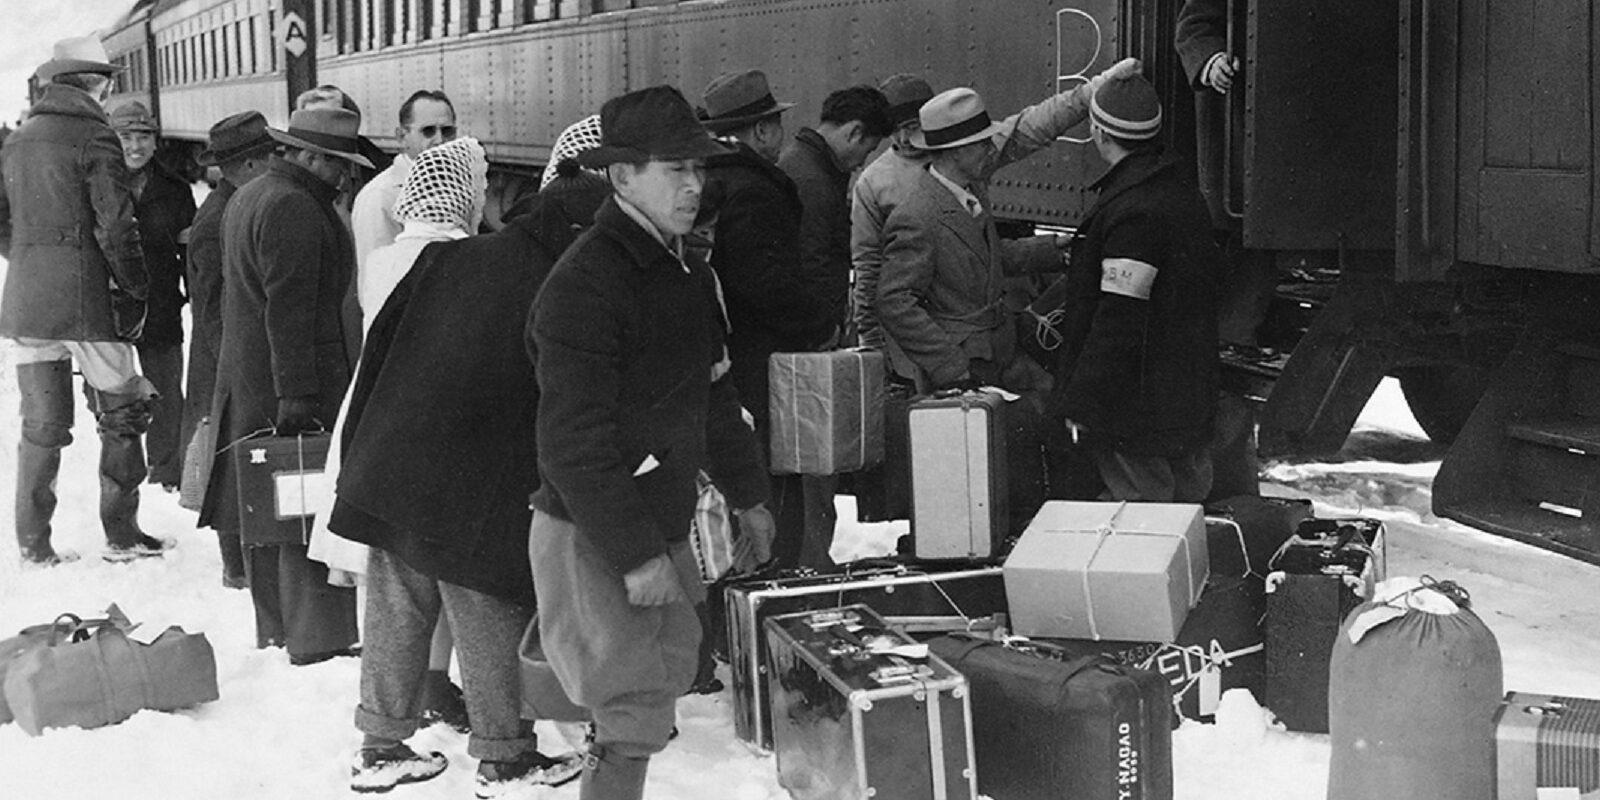 Manzanar internees being sent to the Tule Lake Internment Camp (Year unknown)